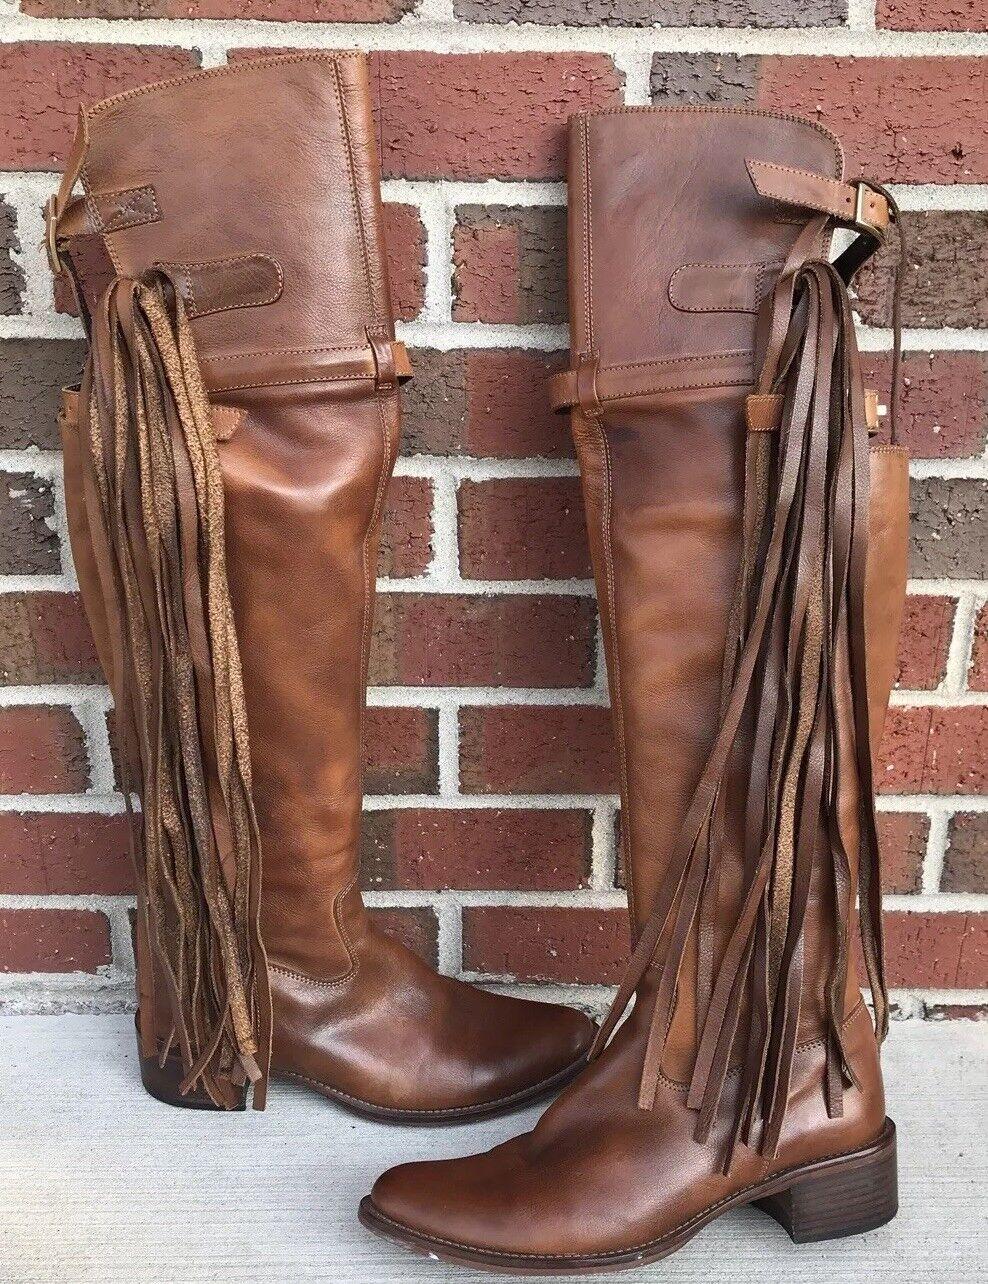 MARIANO RENZI Women's Brown Leather Sz 38 Boots 8535